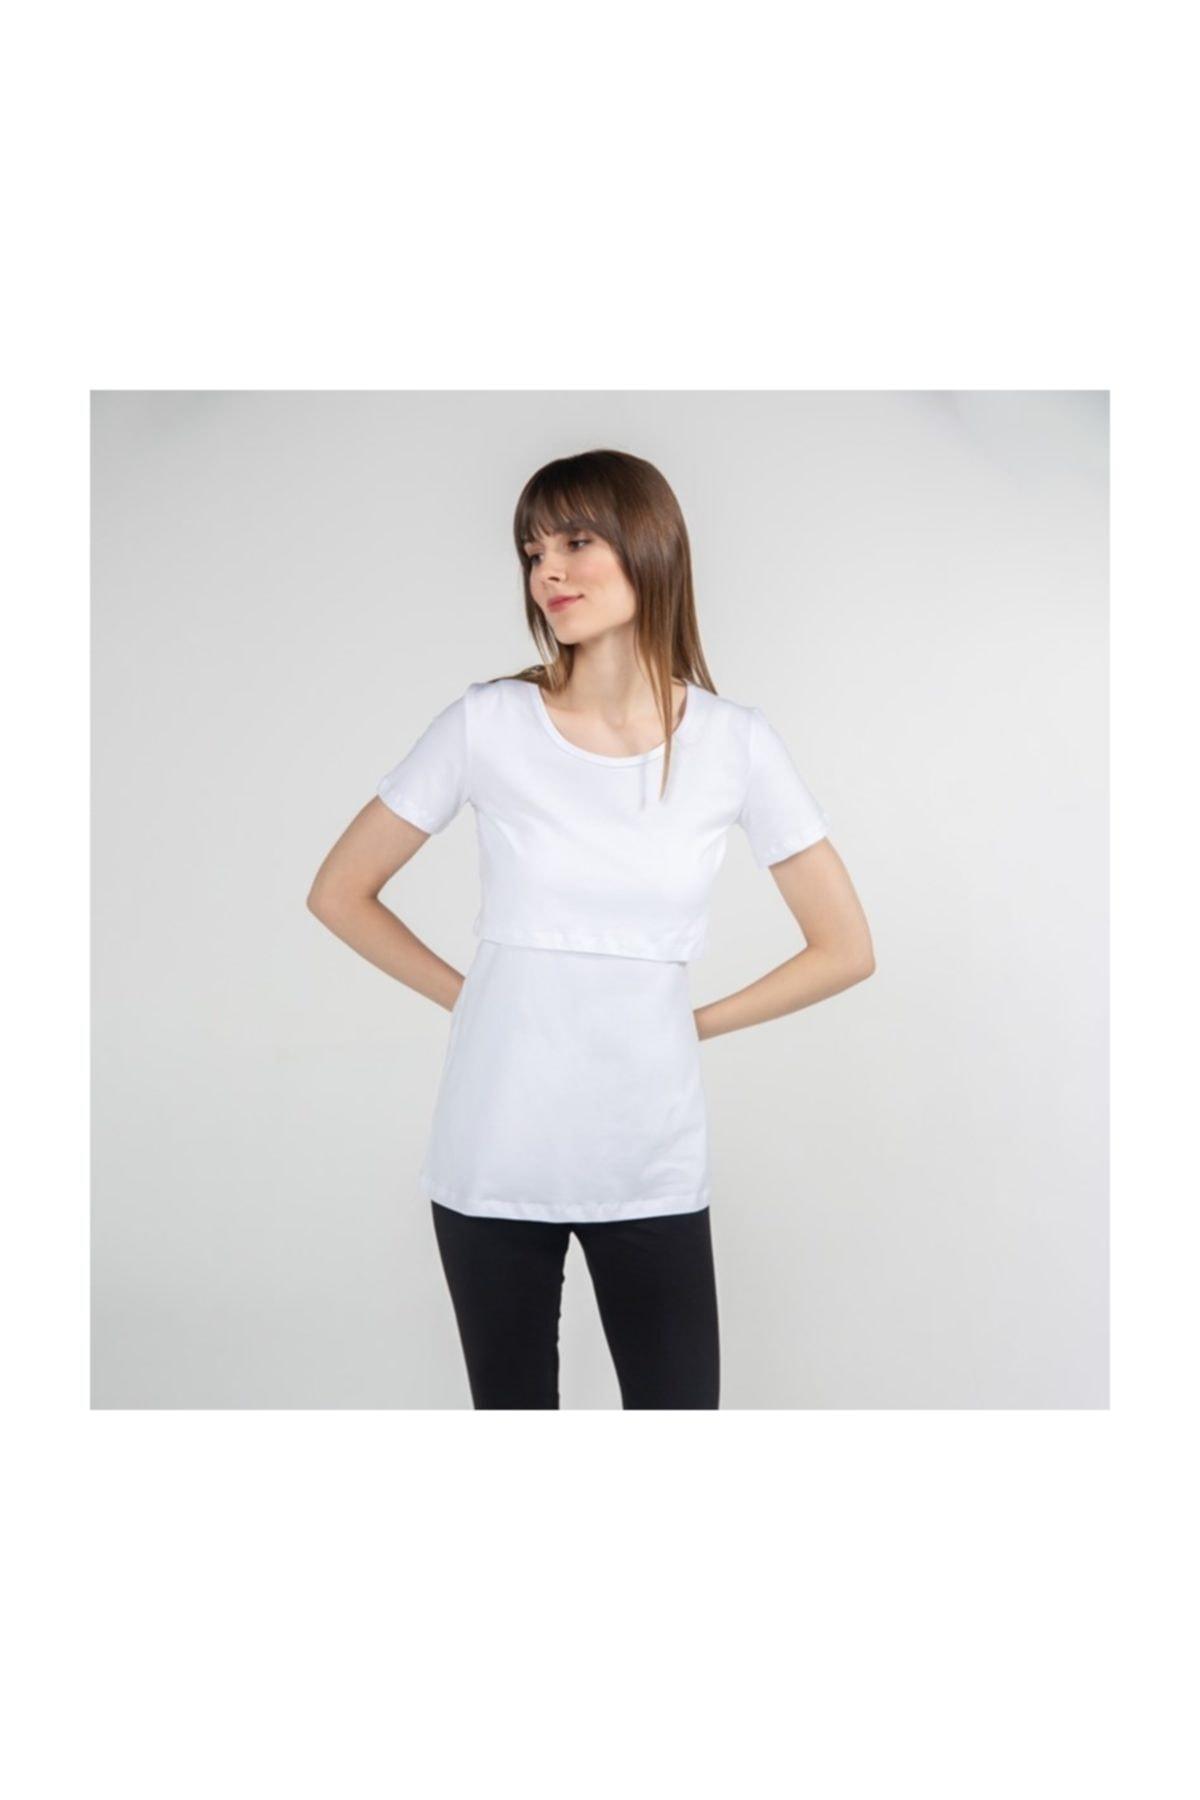 FUNNA MAMMA Kadın Beyaz Bisiklet Yaka Emzirme T-Shirt 2